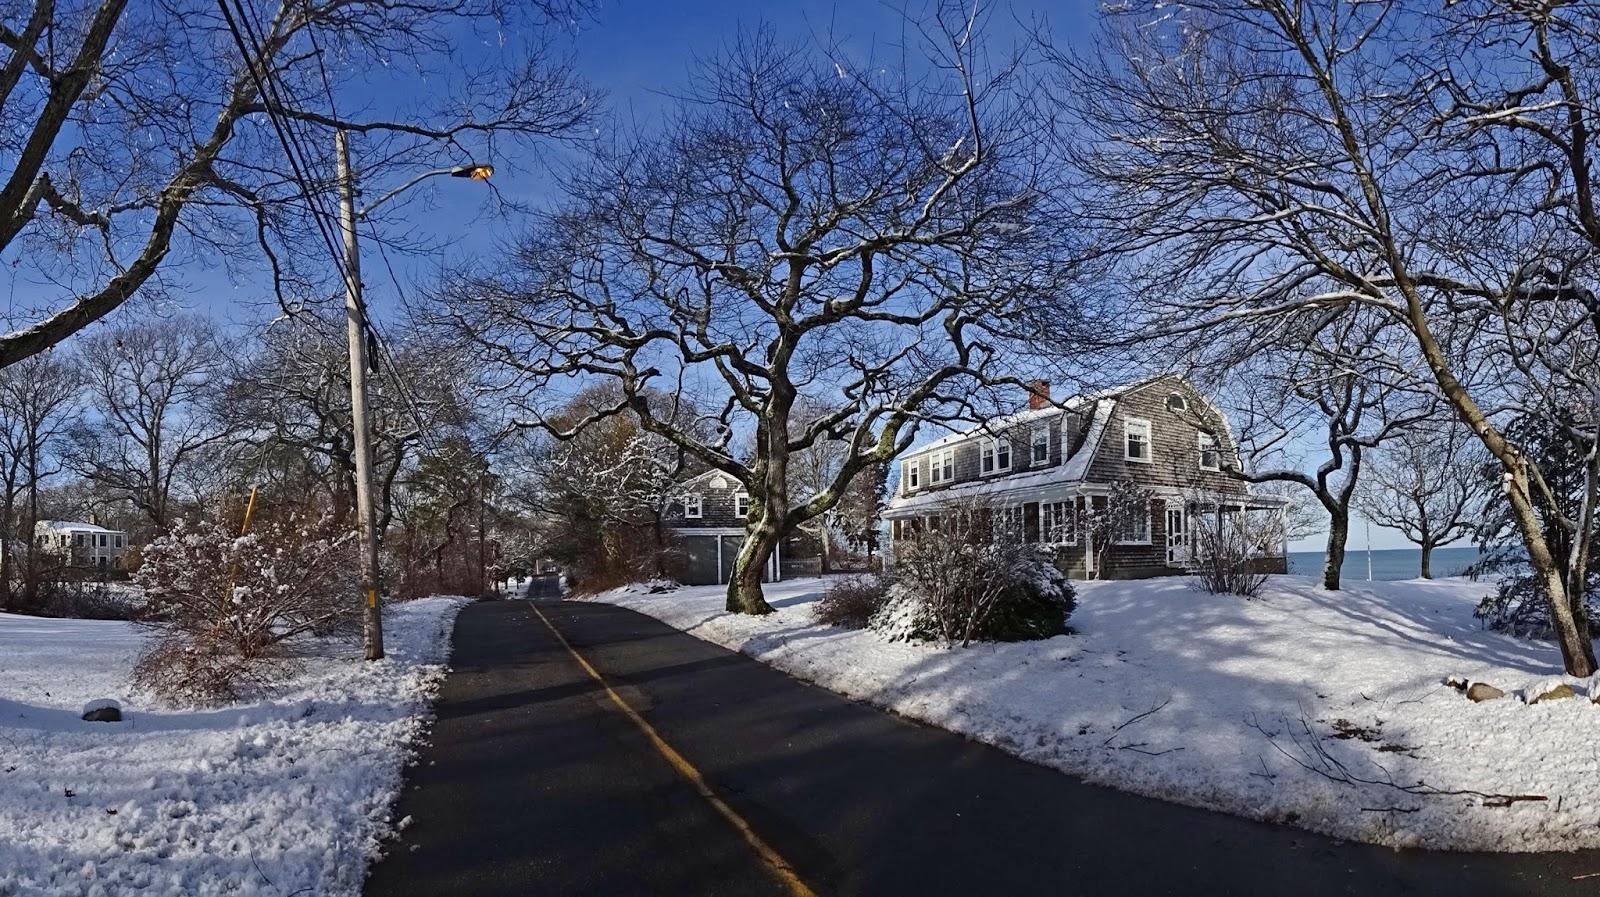 Joe's Retirement Blog: Winter Trees, Manomet, Plymouth